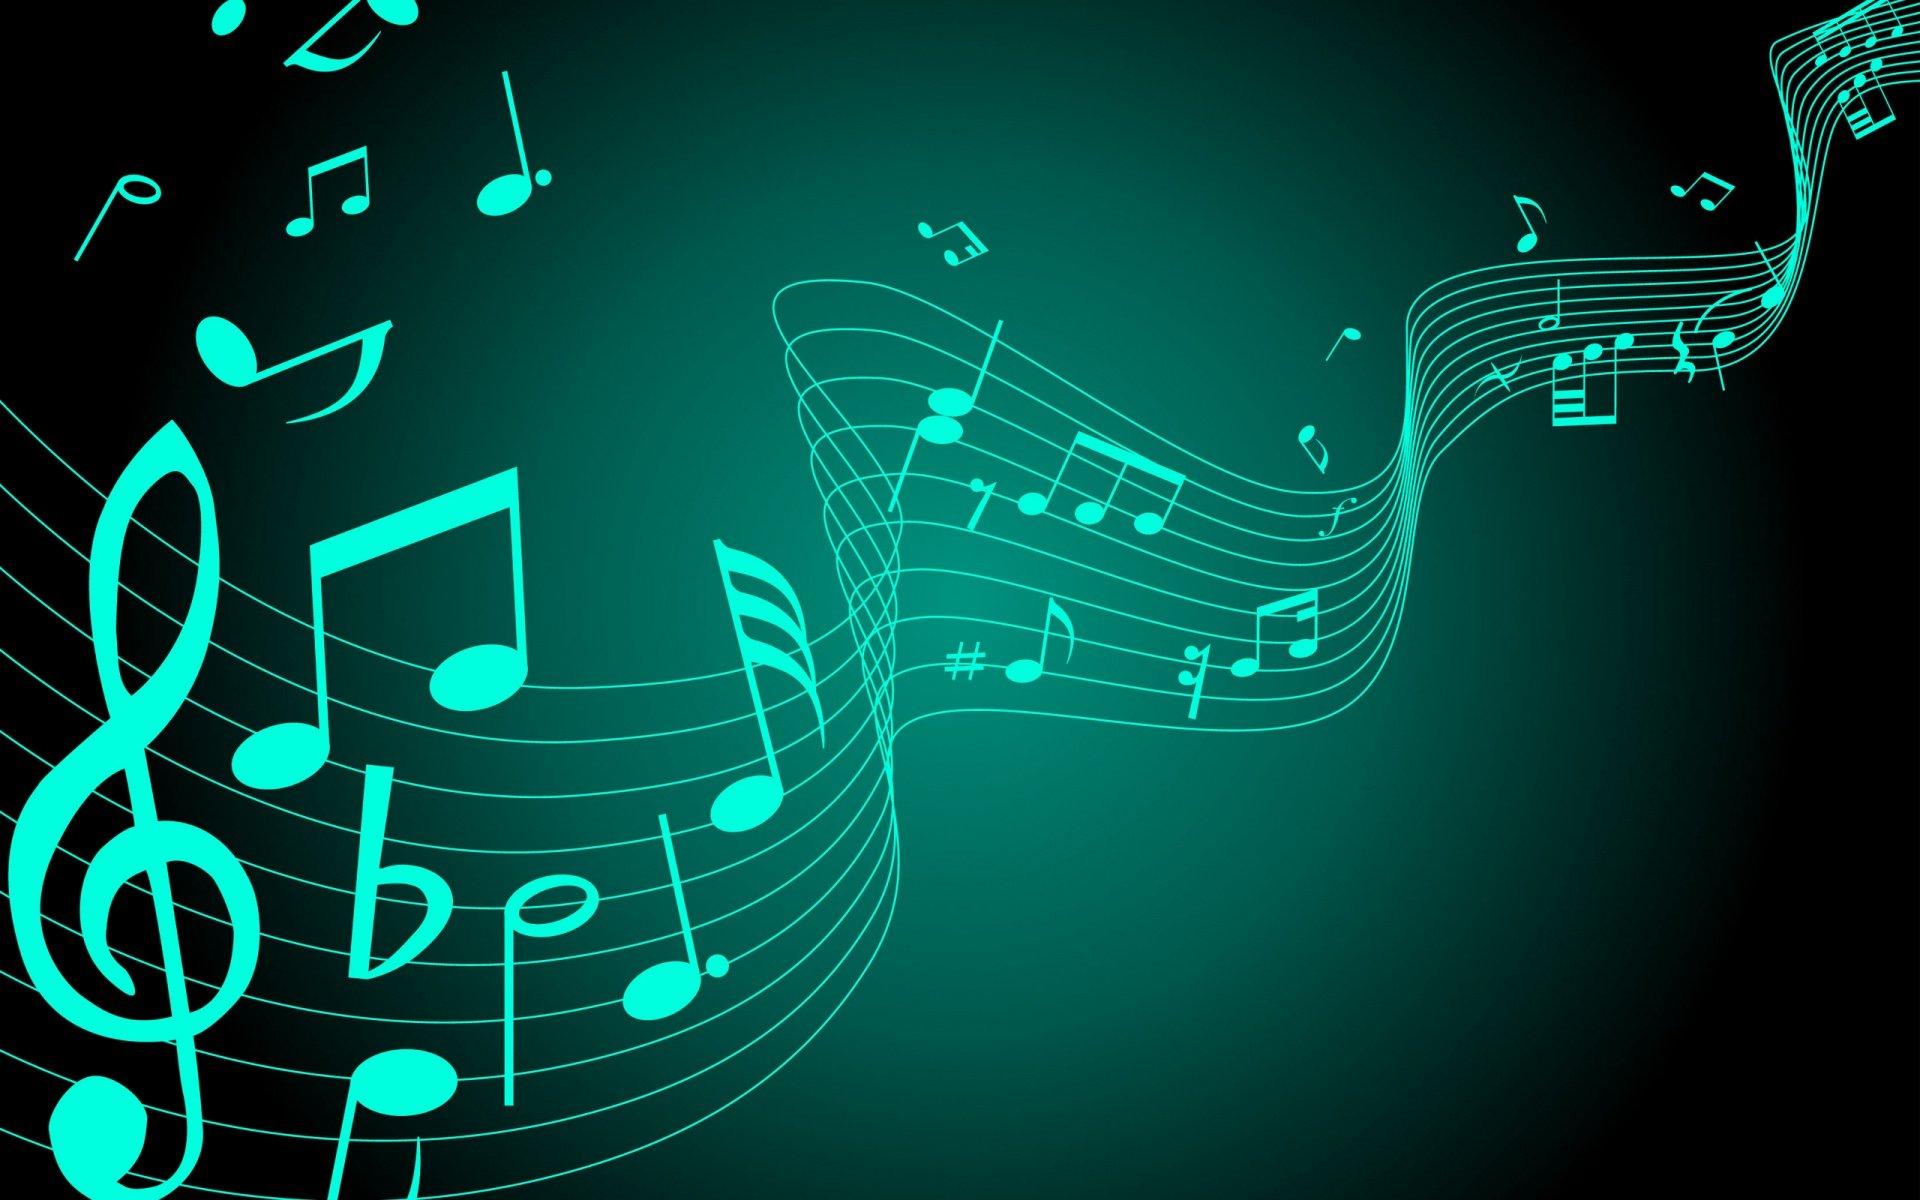 Music-Wallpaper-HD-1080p-42